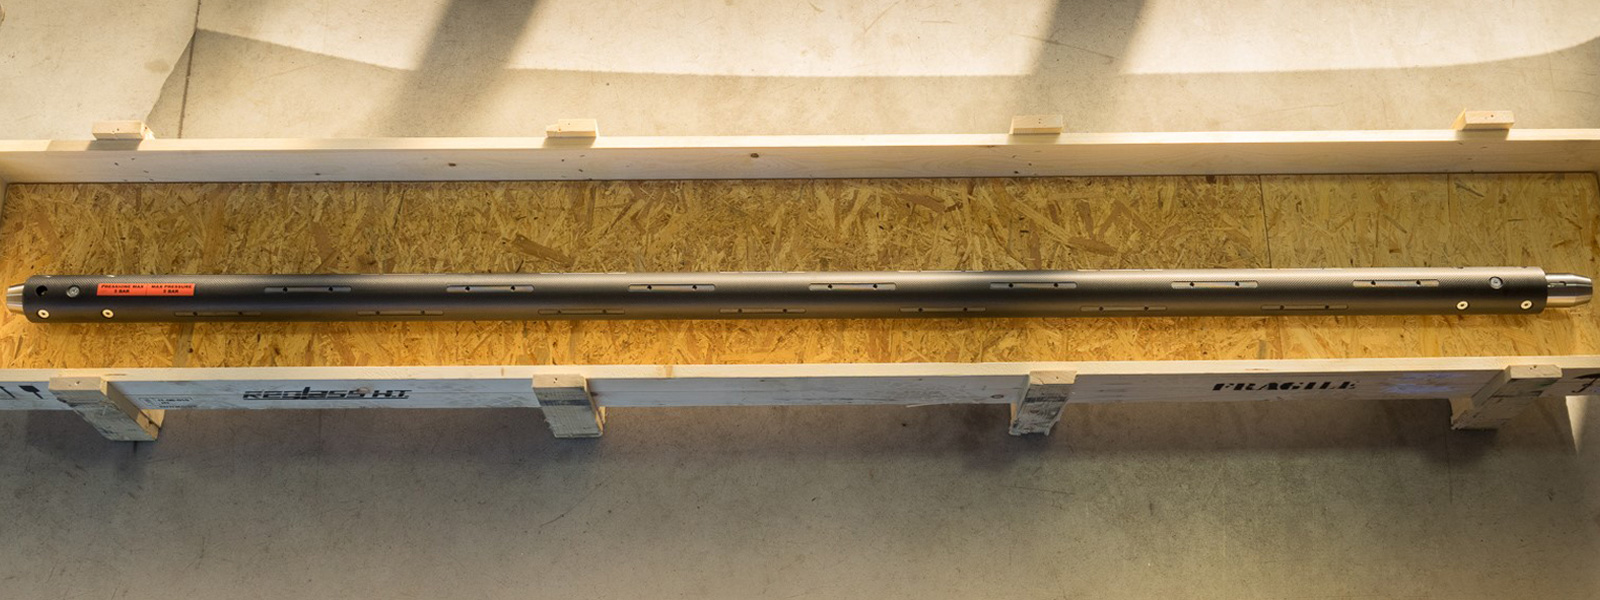 Albero espansibile in fibra di carbonio